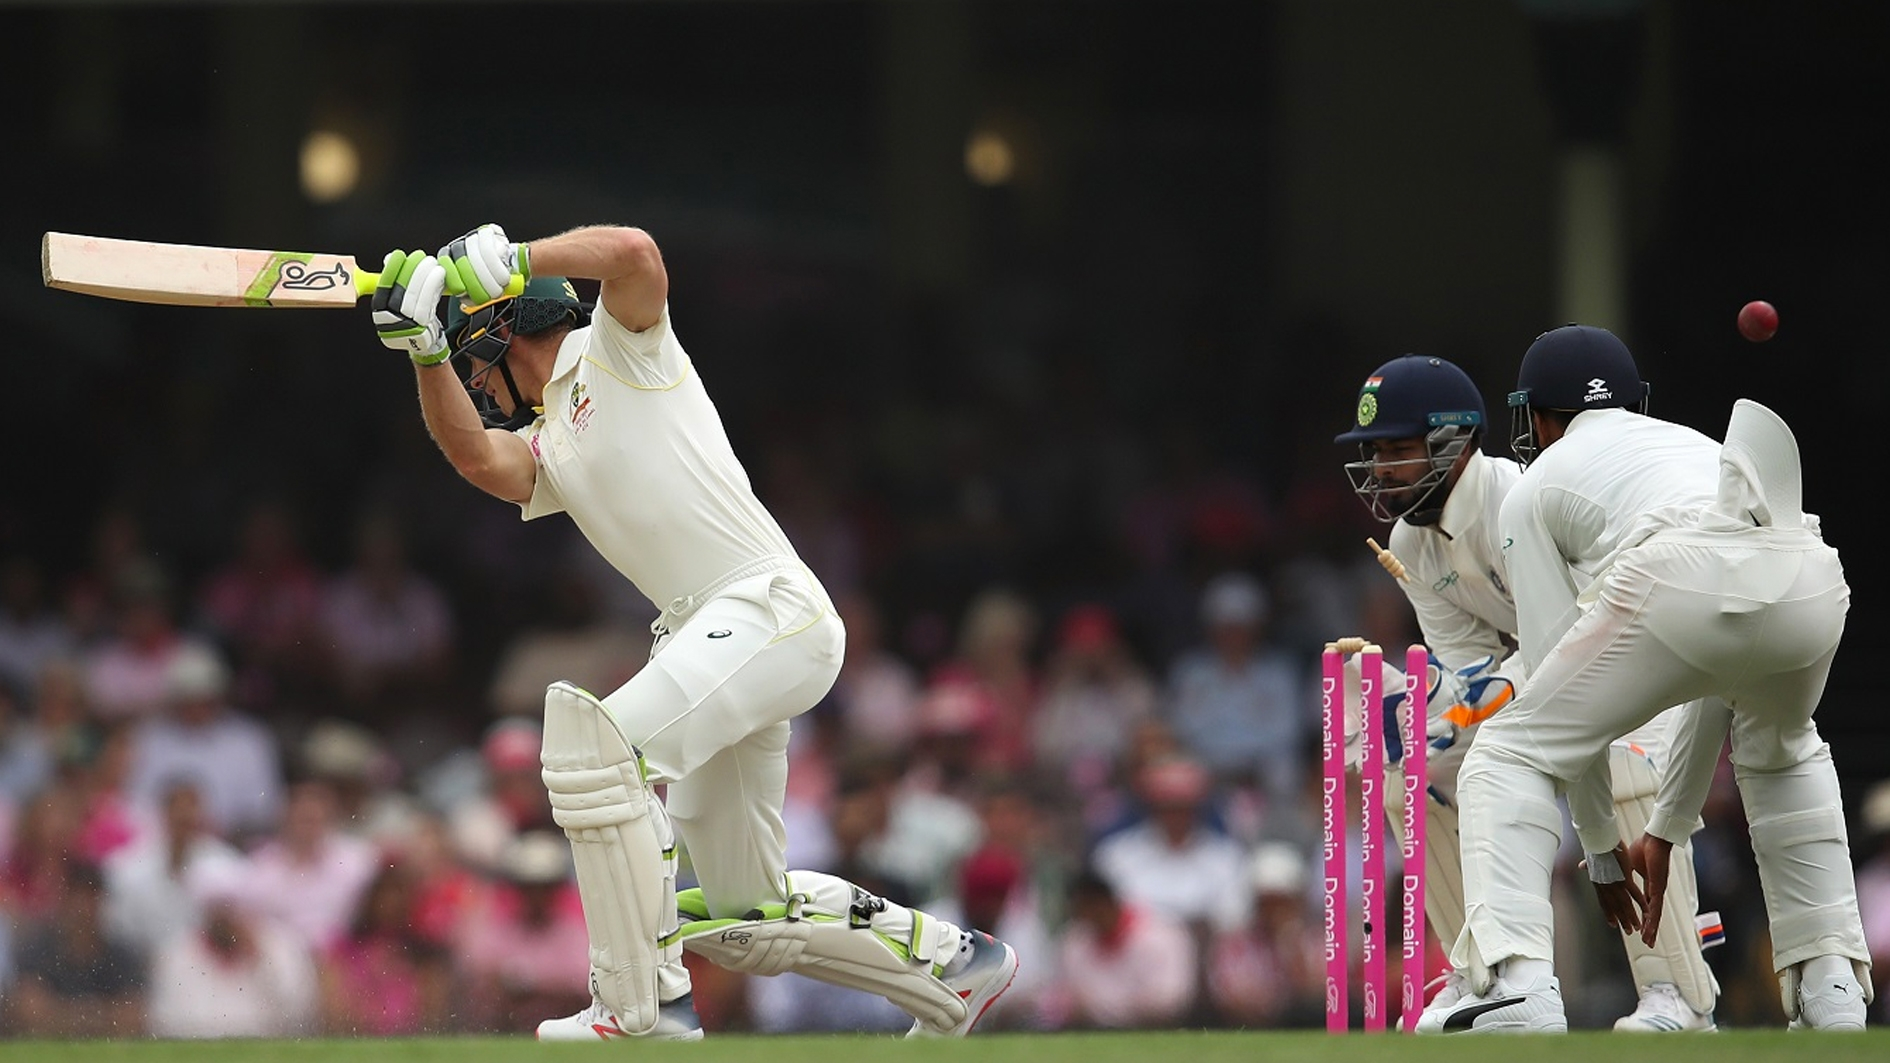 Full Scorecard of Australia vs India 4th Test 2019 - Score Report